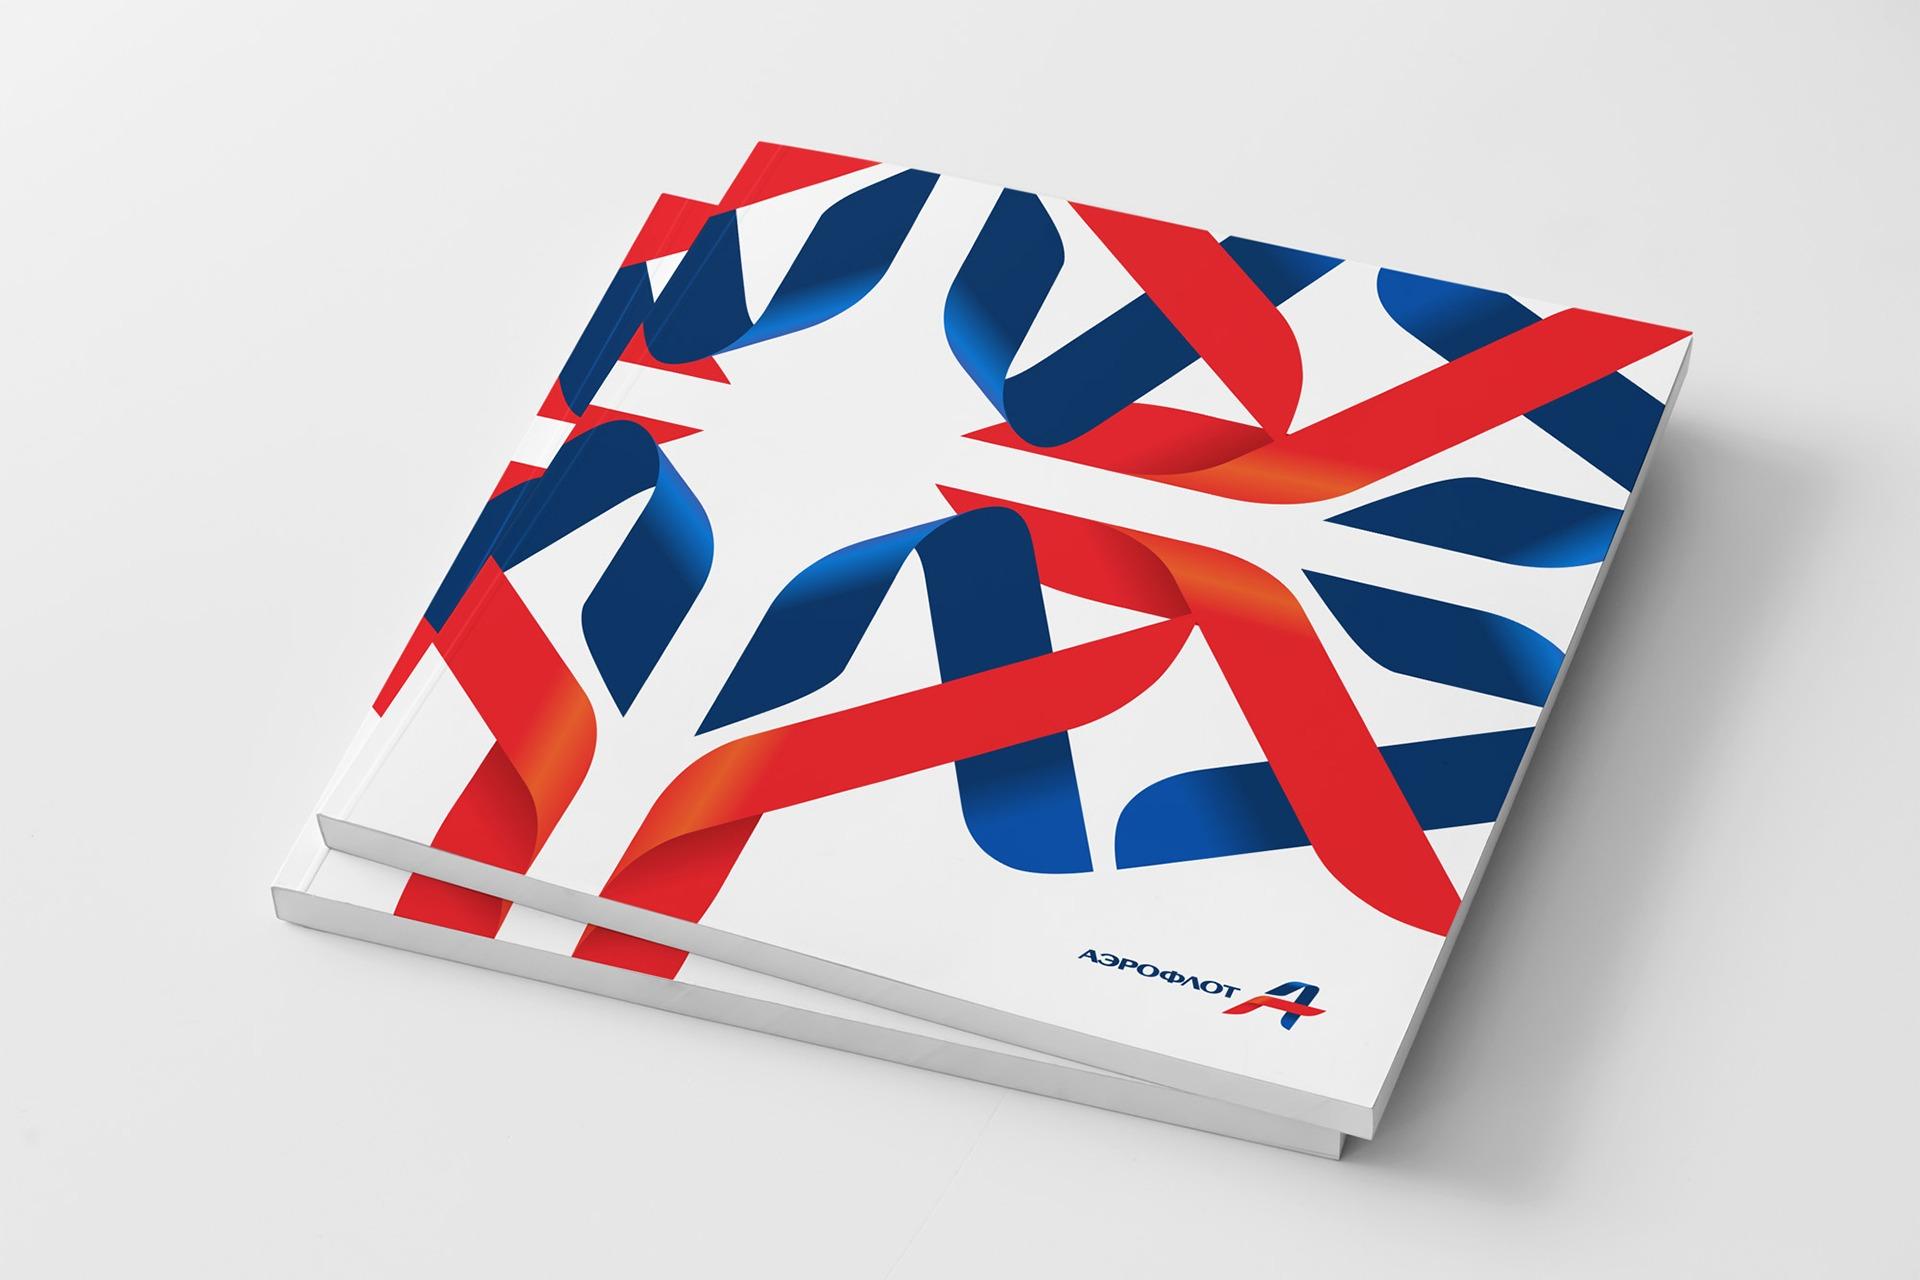 Фирменный стиль Аэрофлот, Asgard Branding, Асгард, лого Аэрофлот, Aeroflot airlines